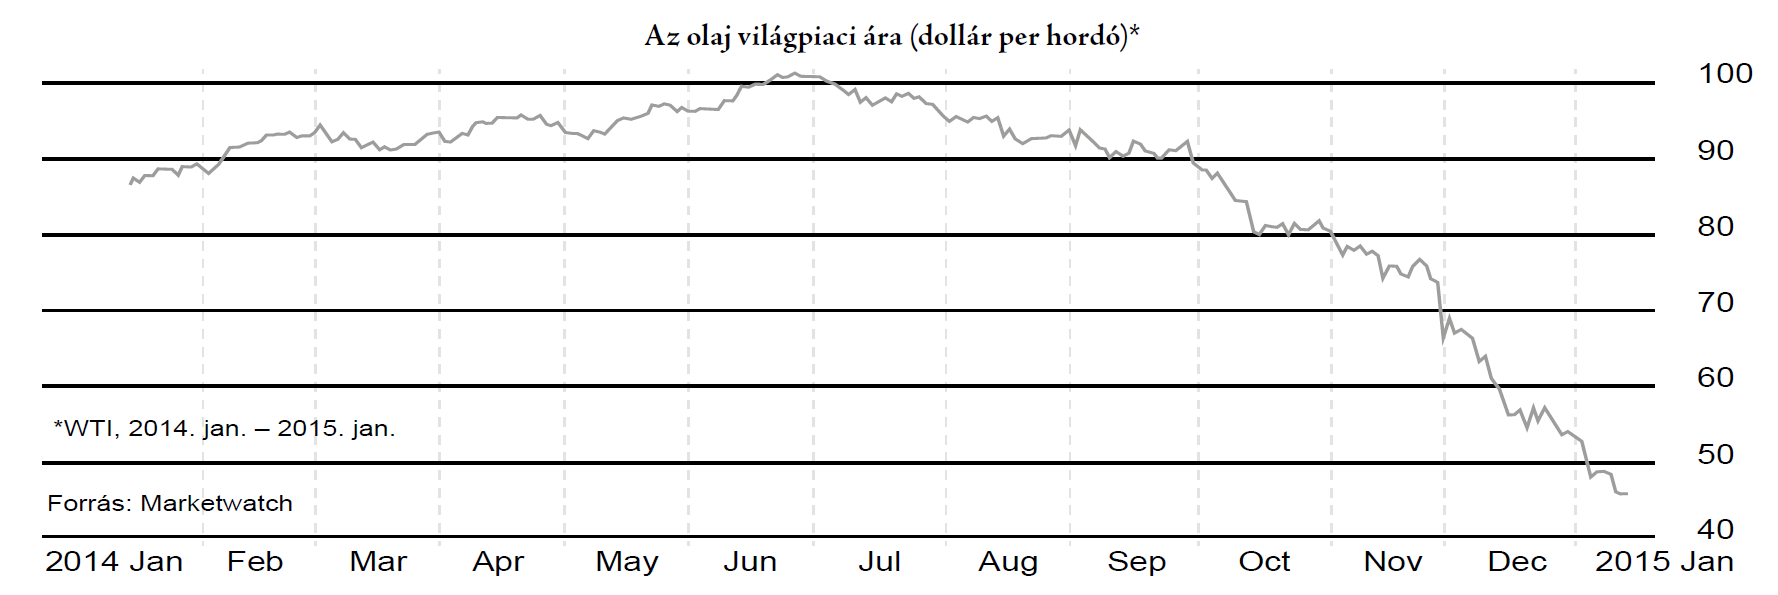 Olaj világpiaci ára